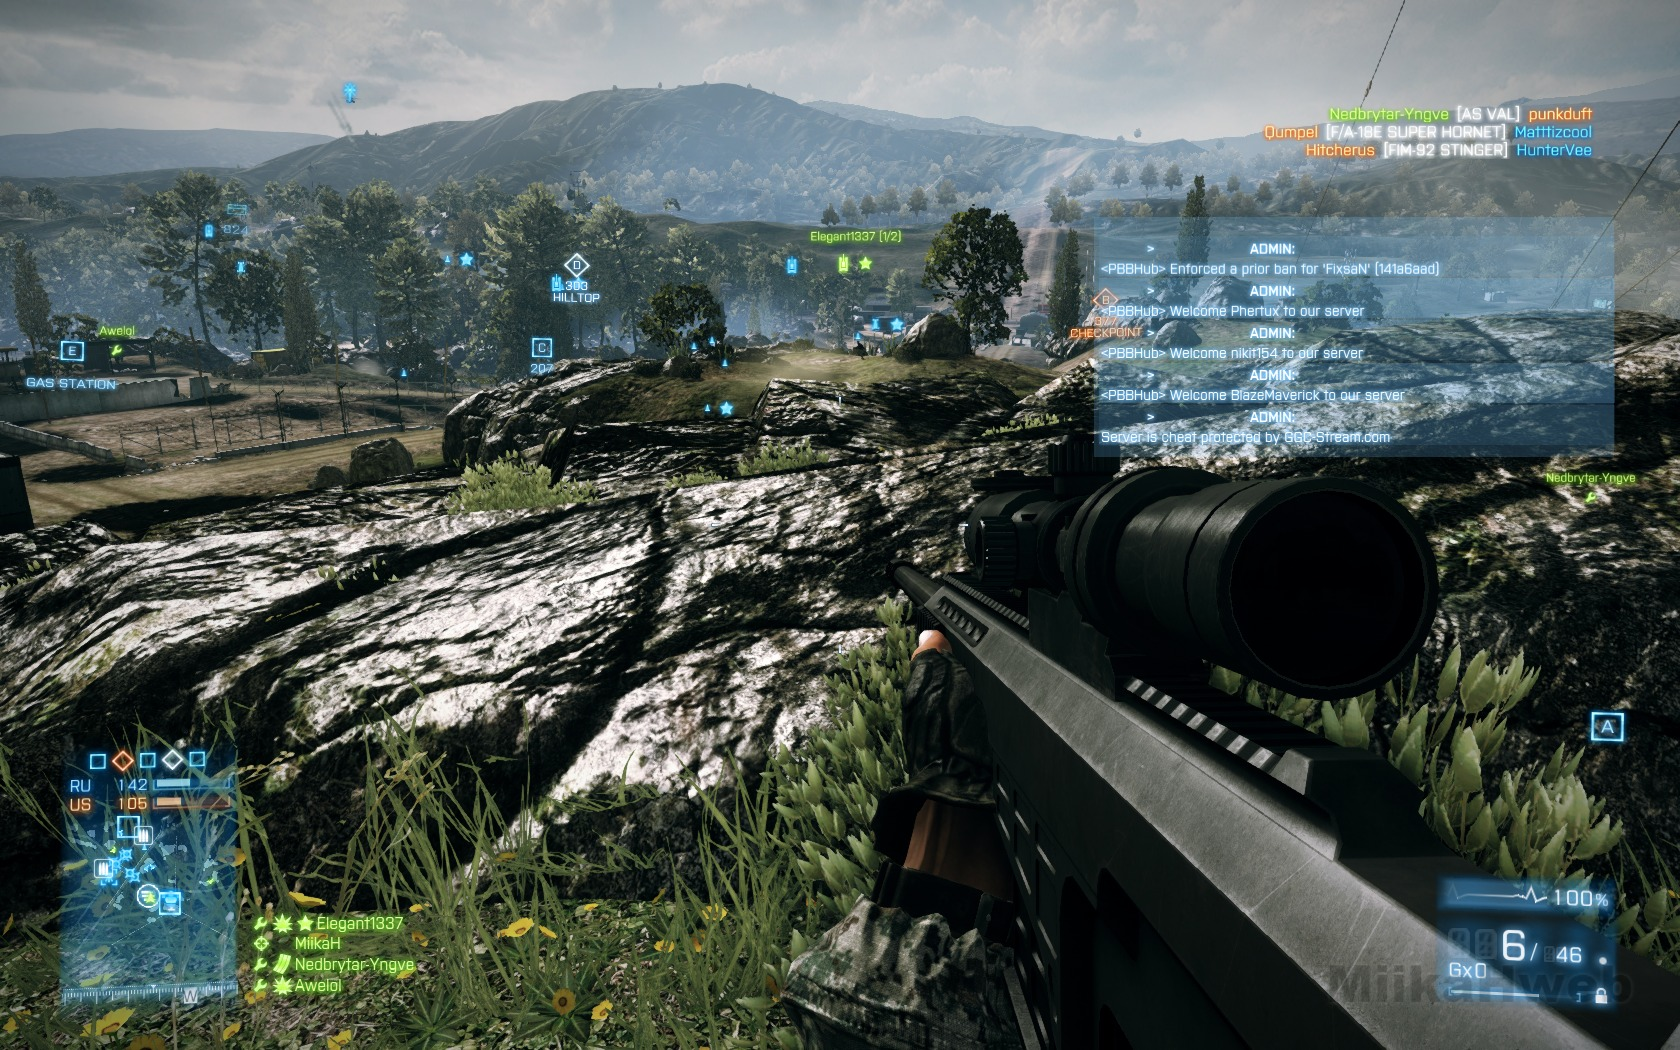 MiikaHweb - Game : Battlefield 3